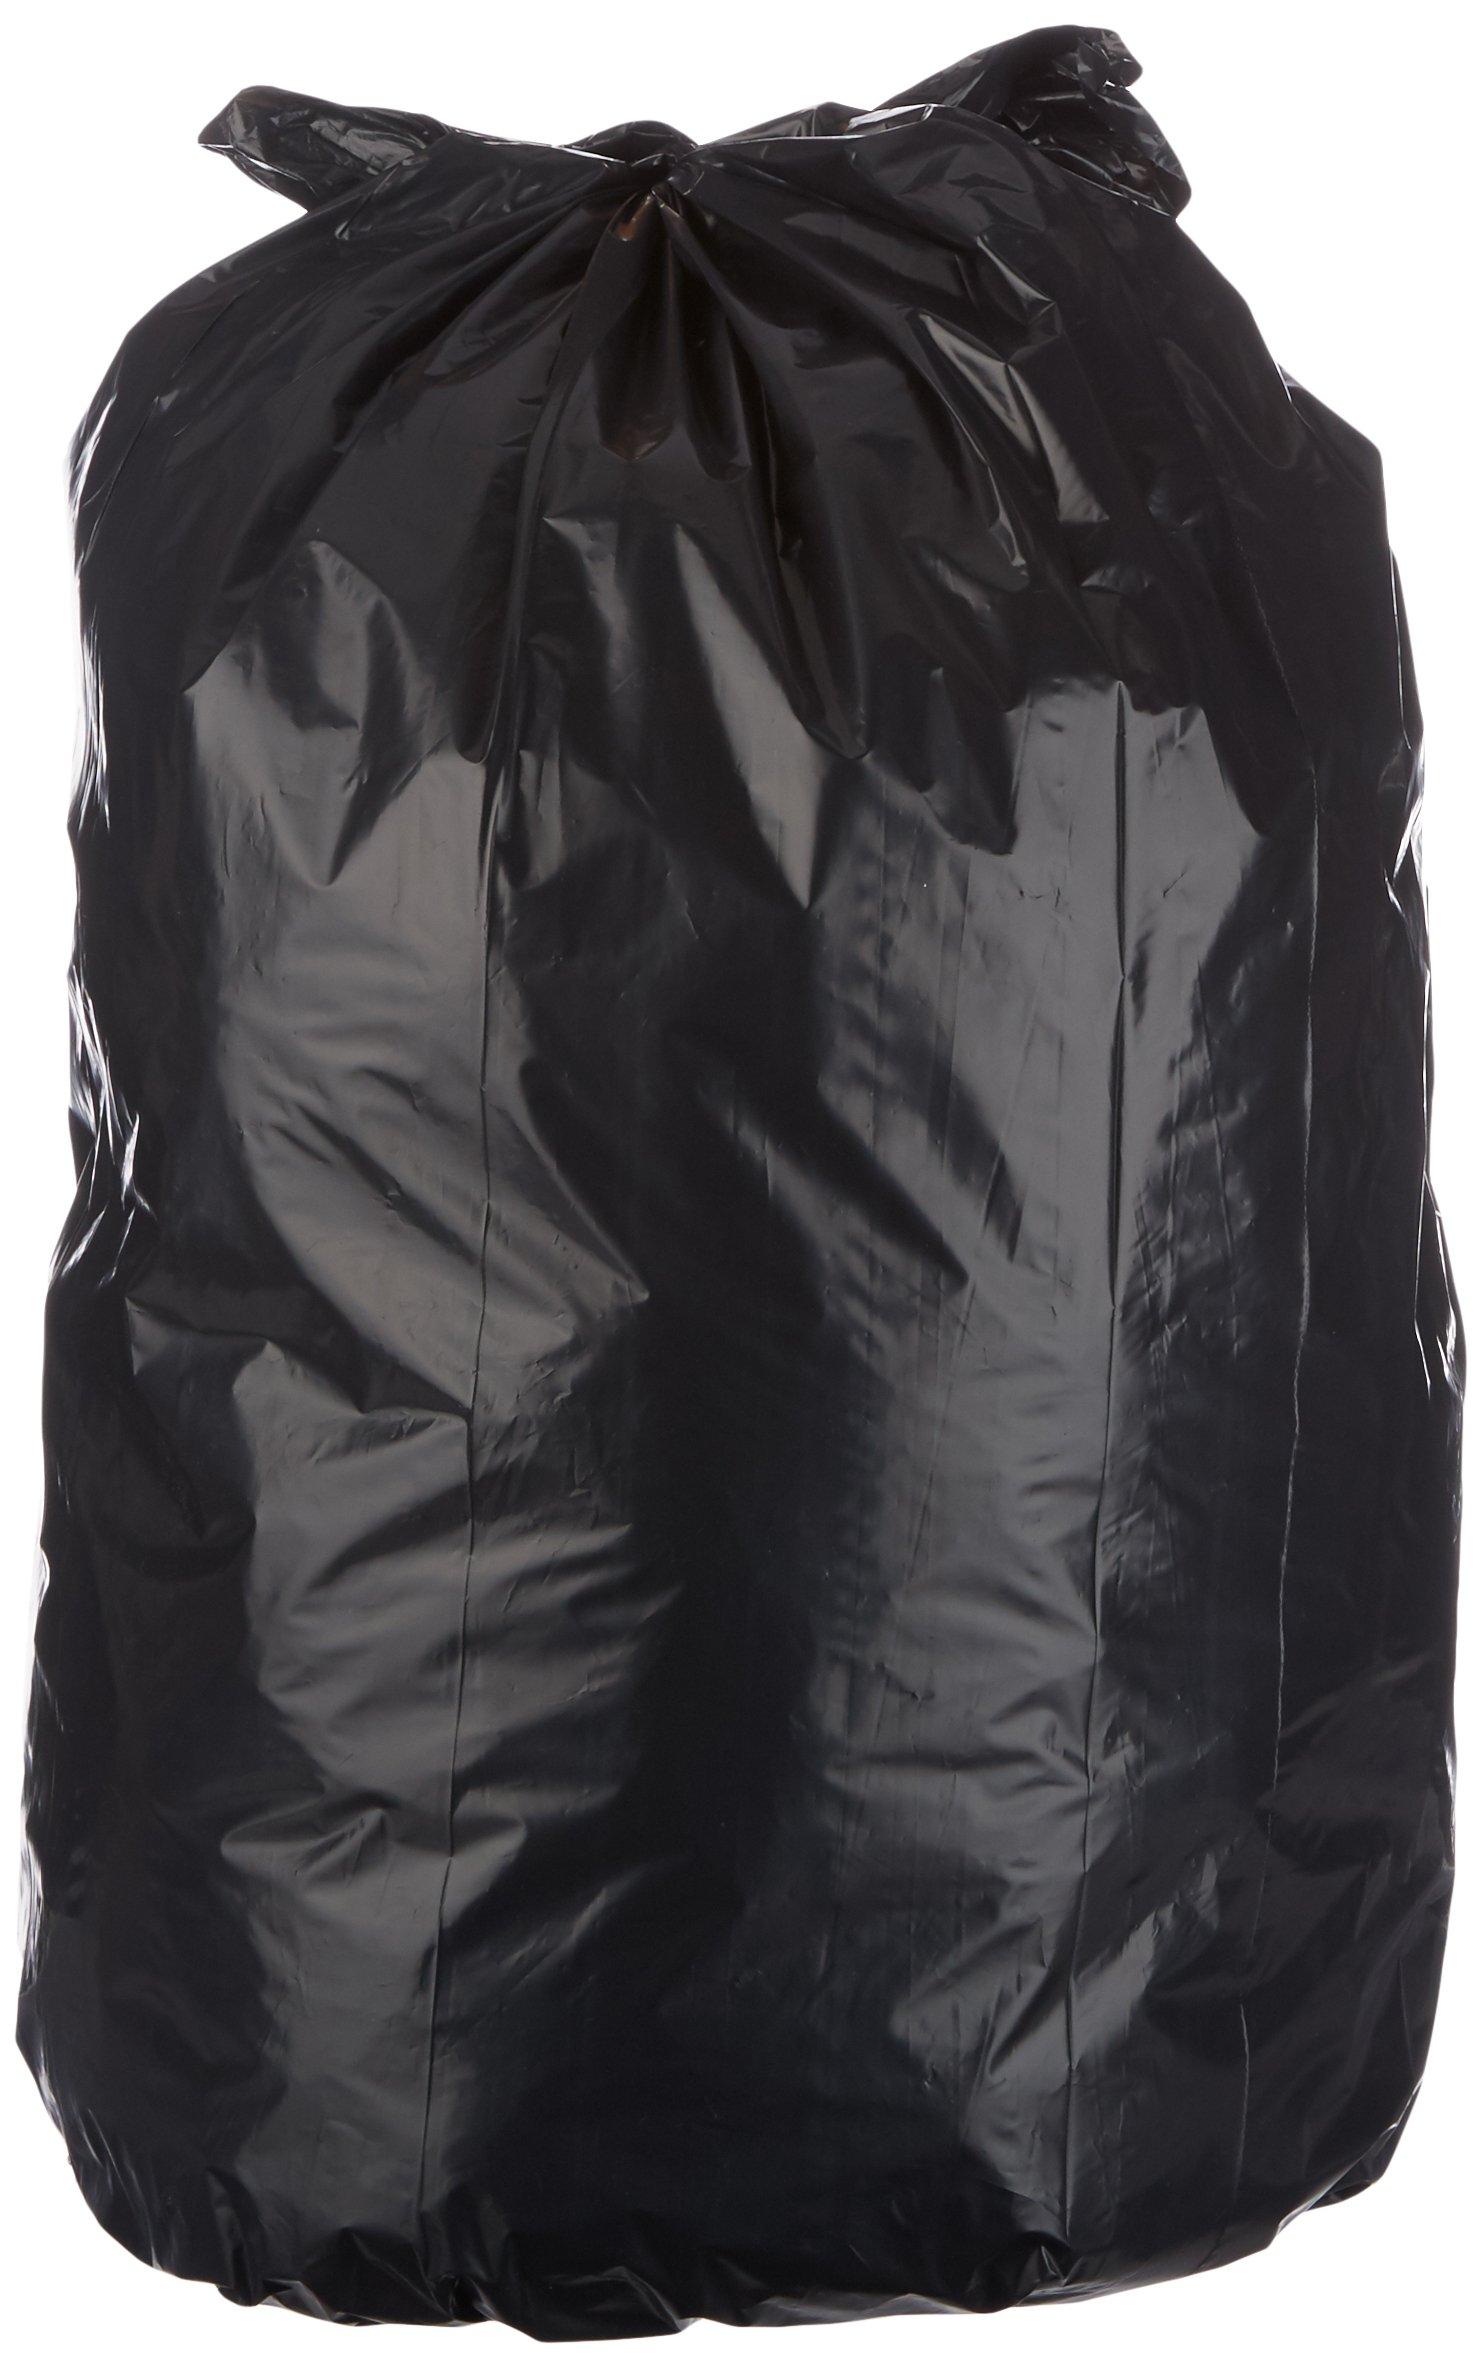 AmazonBasics 23 Gallon Slim Trash Can Liner, 1.6 mil, Black, 250-Count